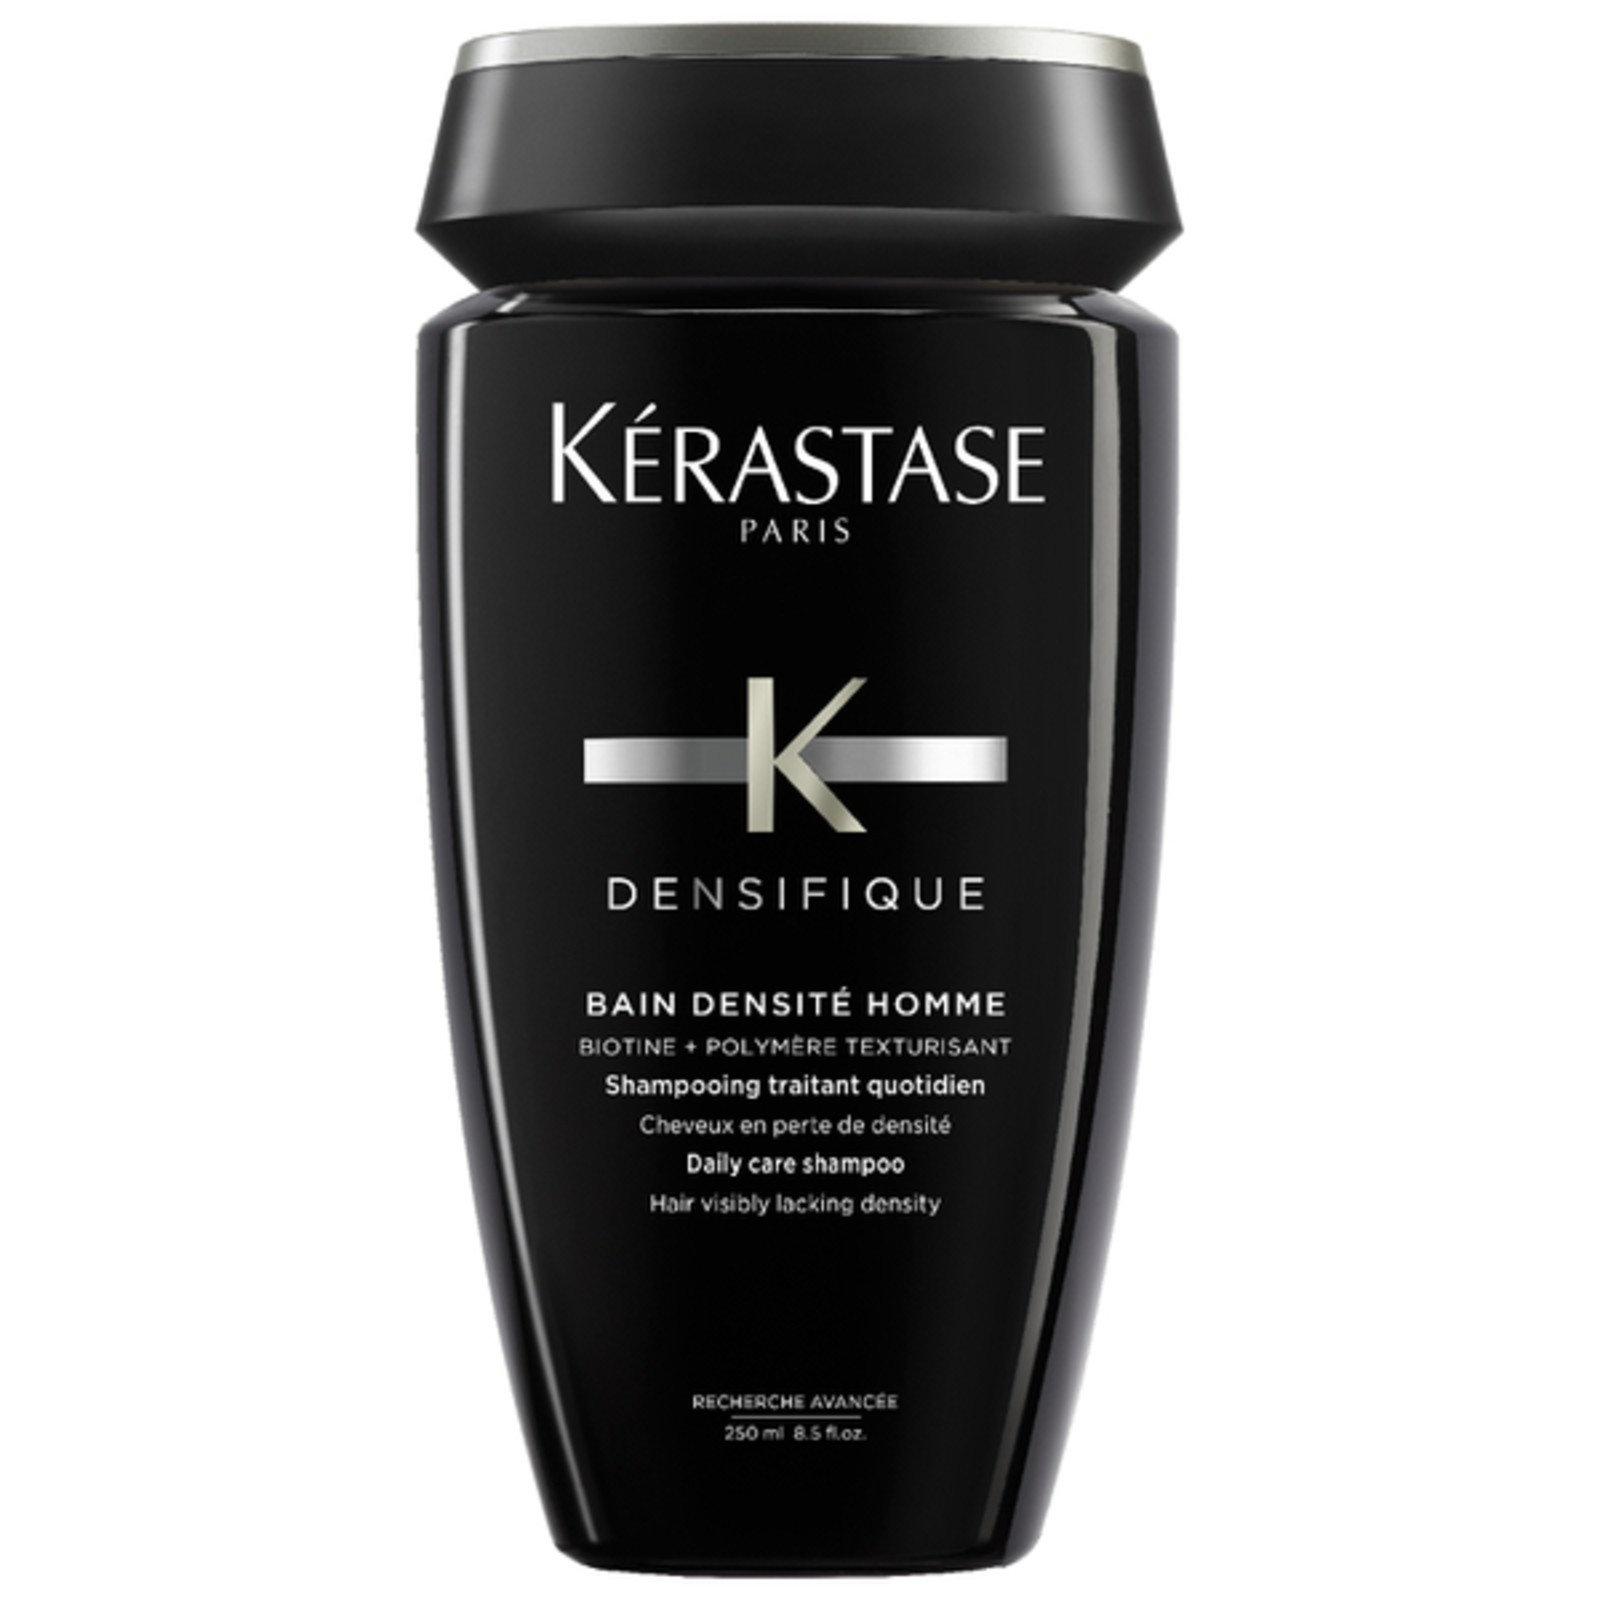 Kérastase Densifique Bain Densité Homme - Shampoo 250ml - CA